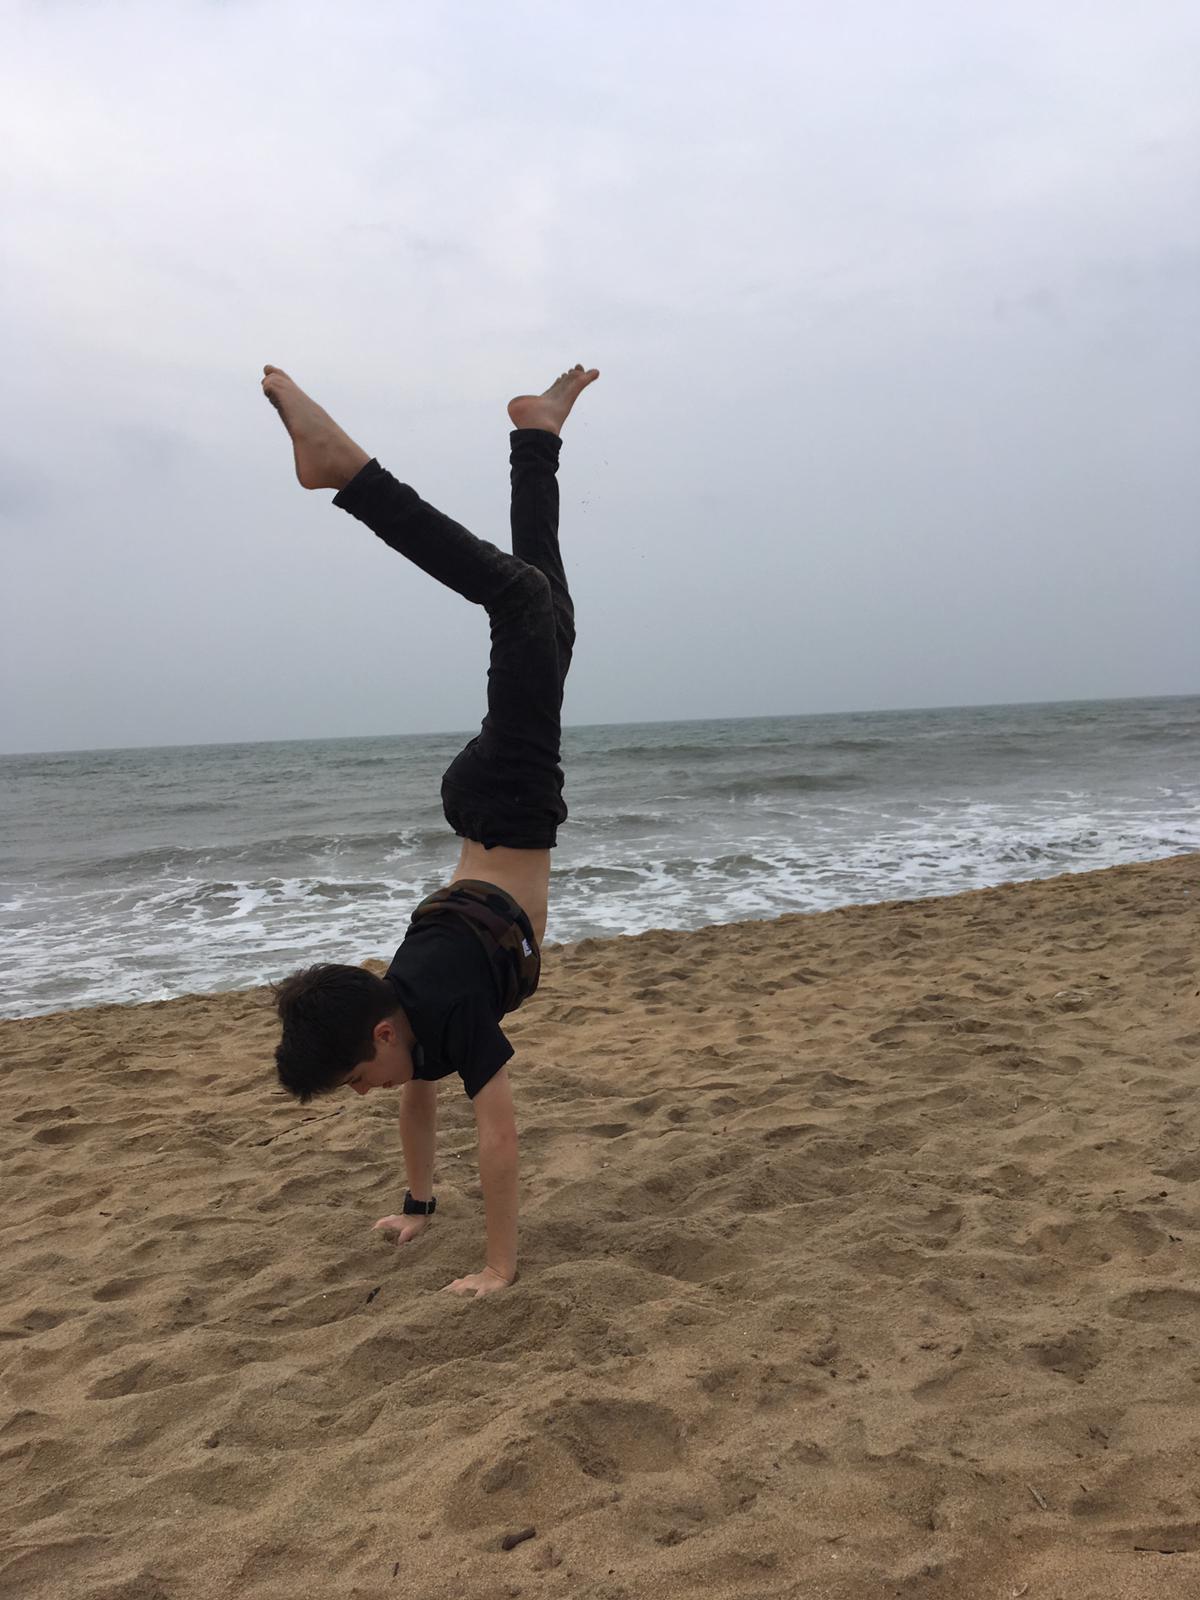 invite-to-paradise-sri-lanka-family-holiday-specialists-customer-feedback-pickering-handstand-2.jpg